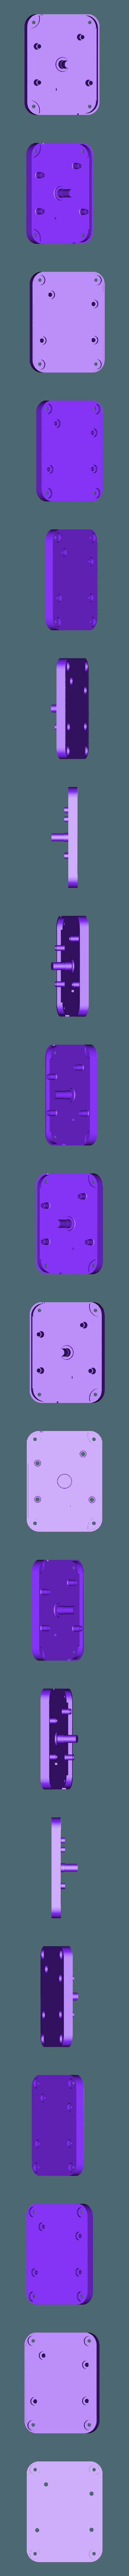 Handbrake__plate.stl Download OBJ file USB Rally Handbrake • 3D print template, GoldenBlack